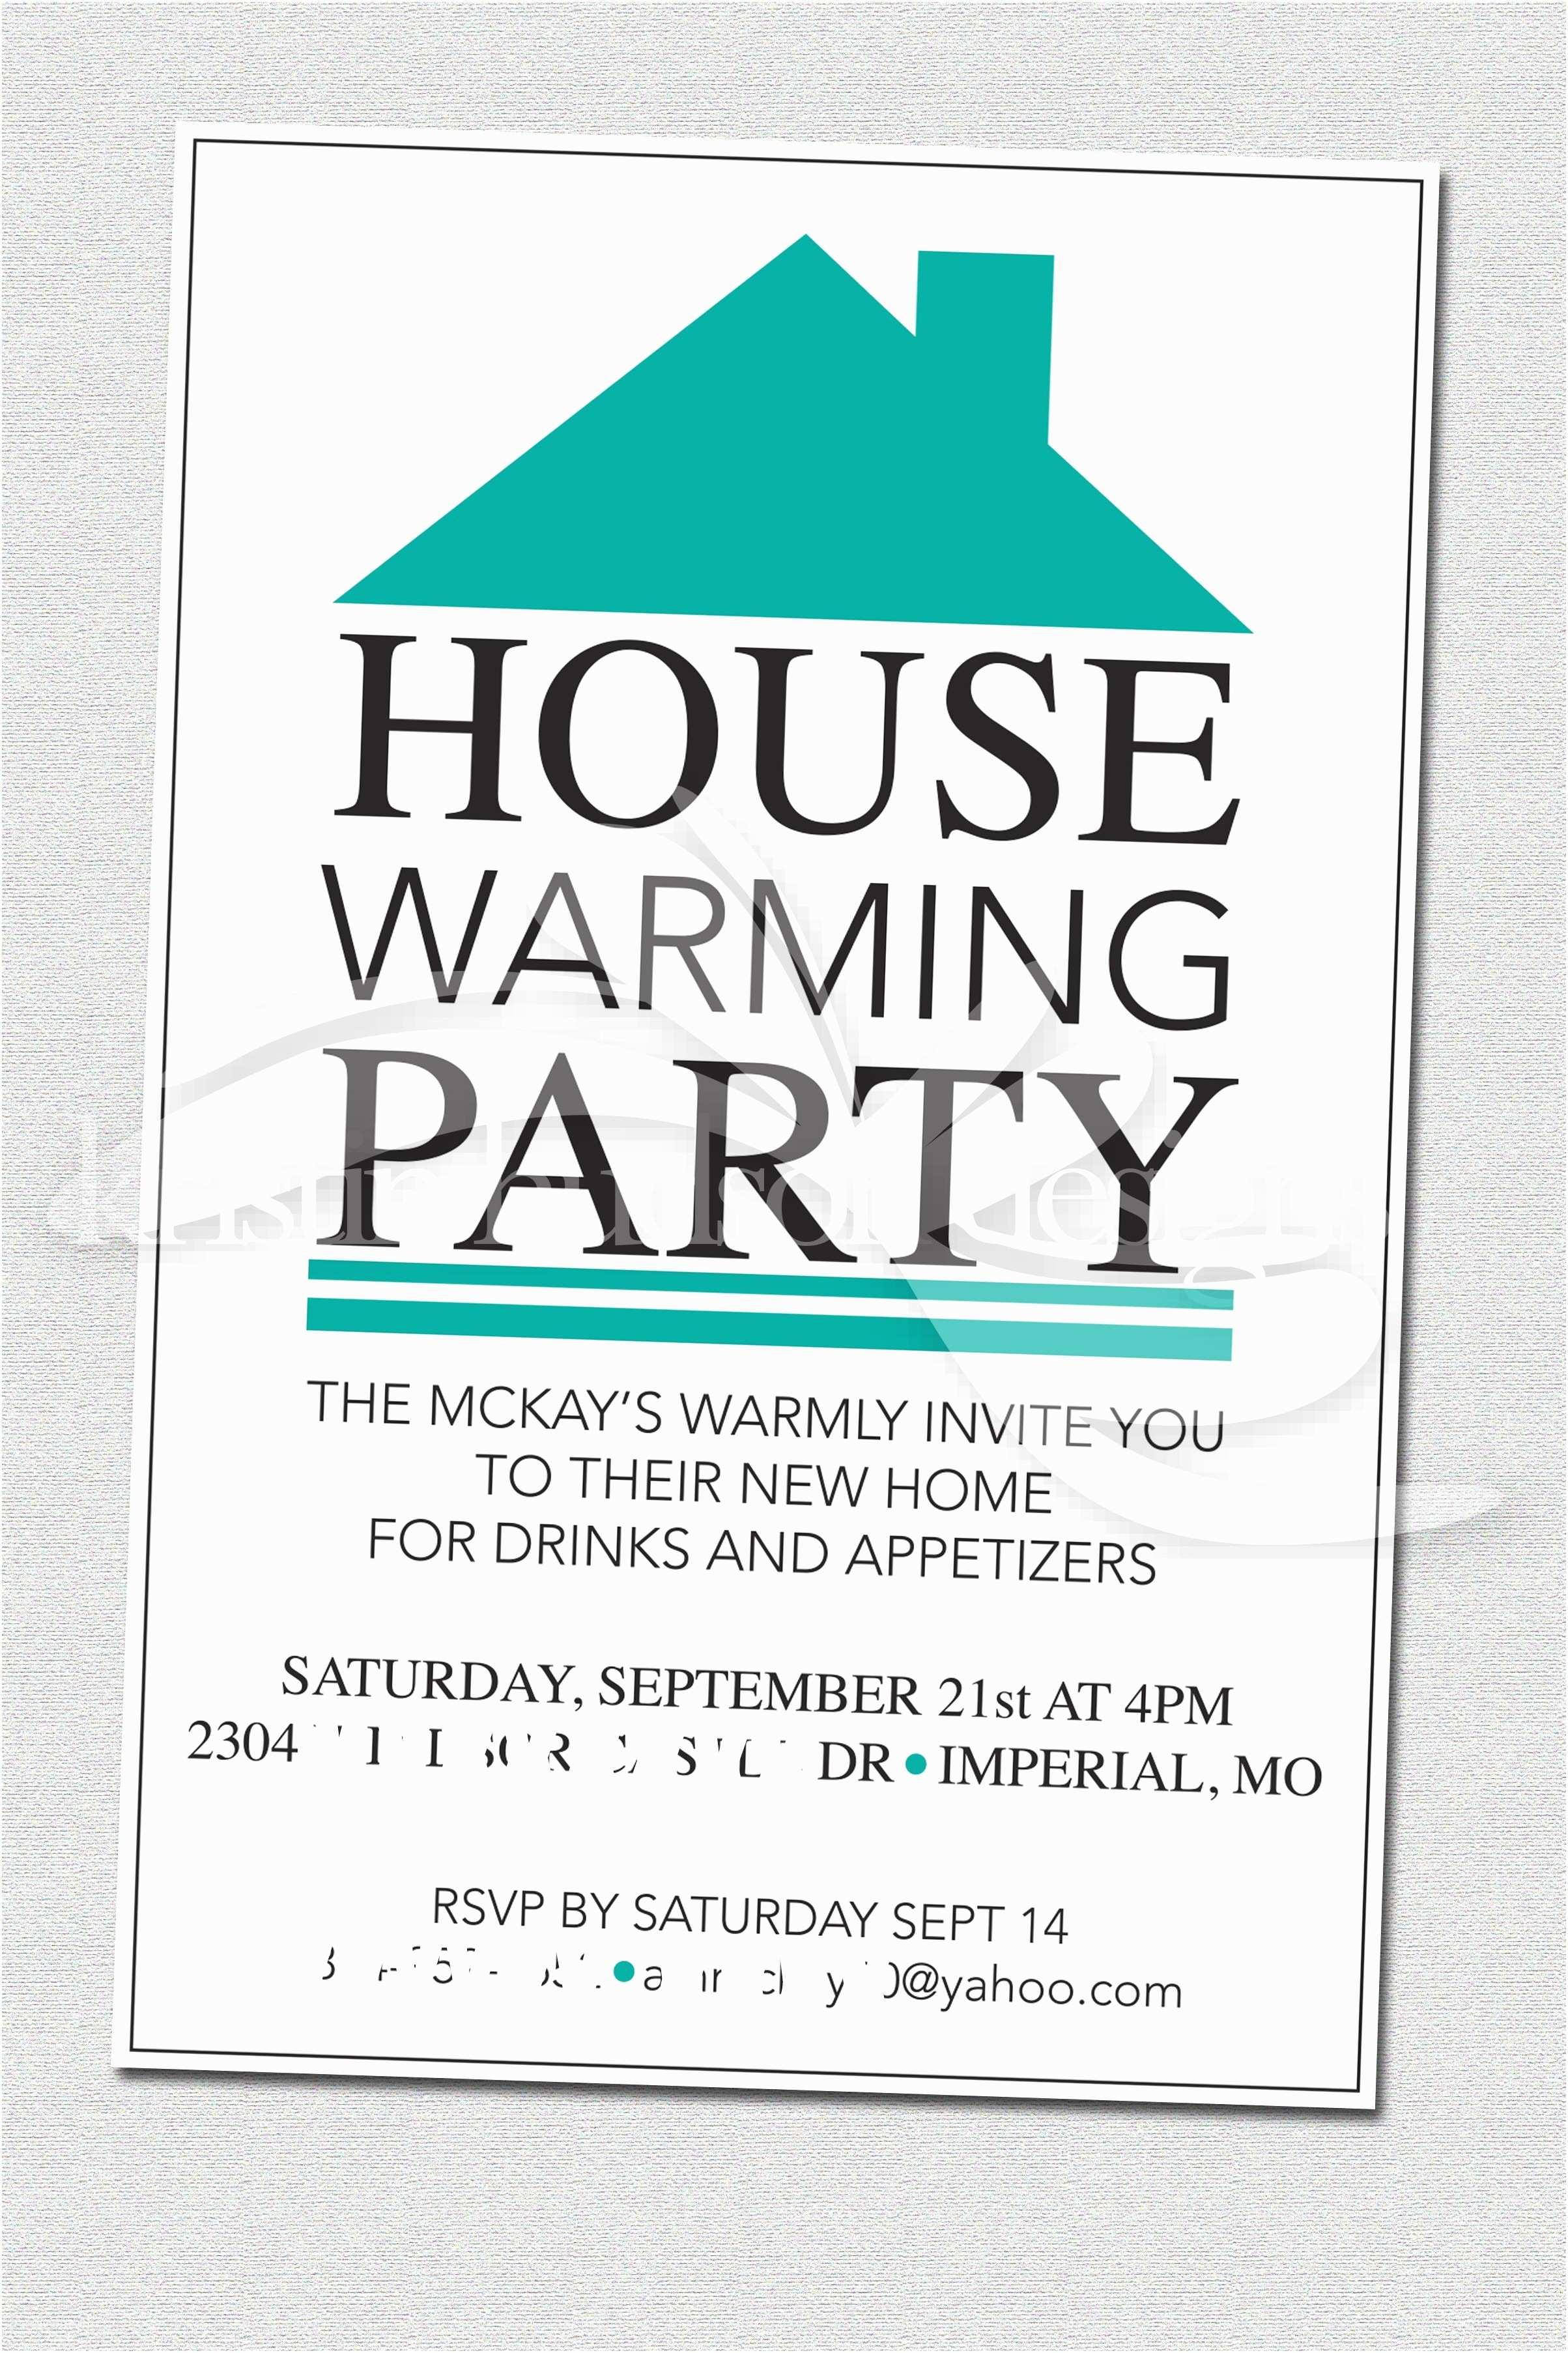 Housewarming Party Invitation Wording Invitation Wording Housewarming Party Archives